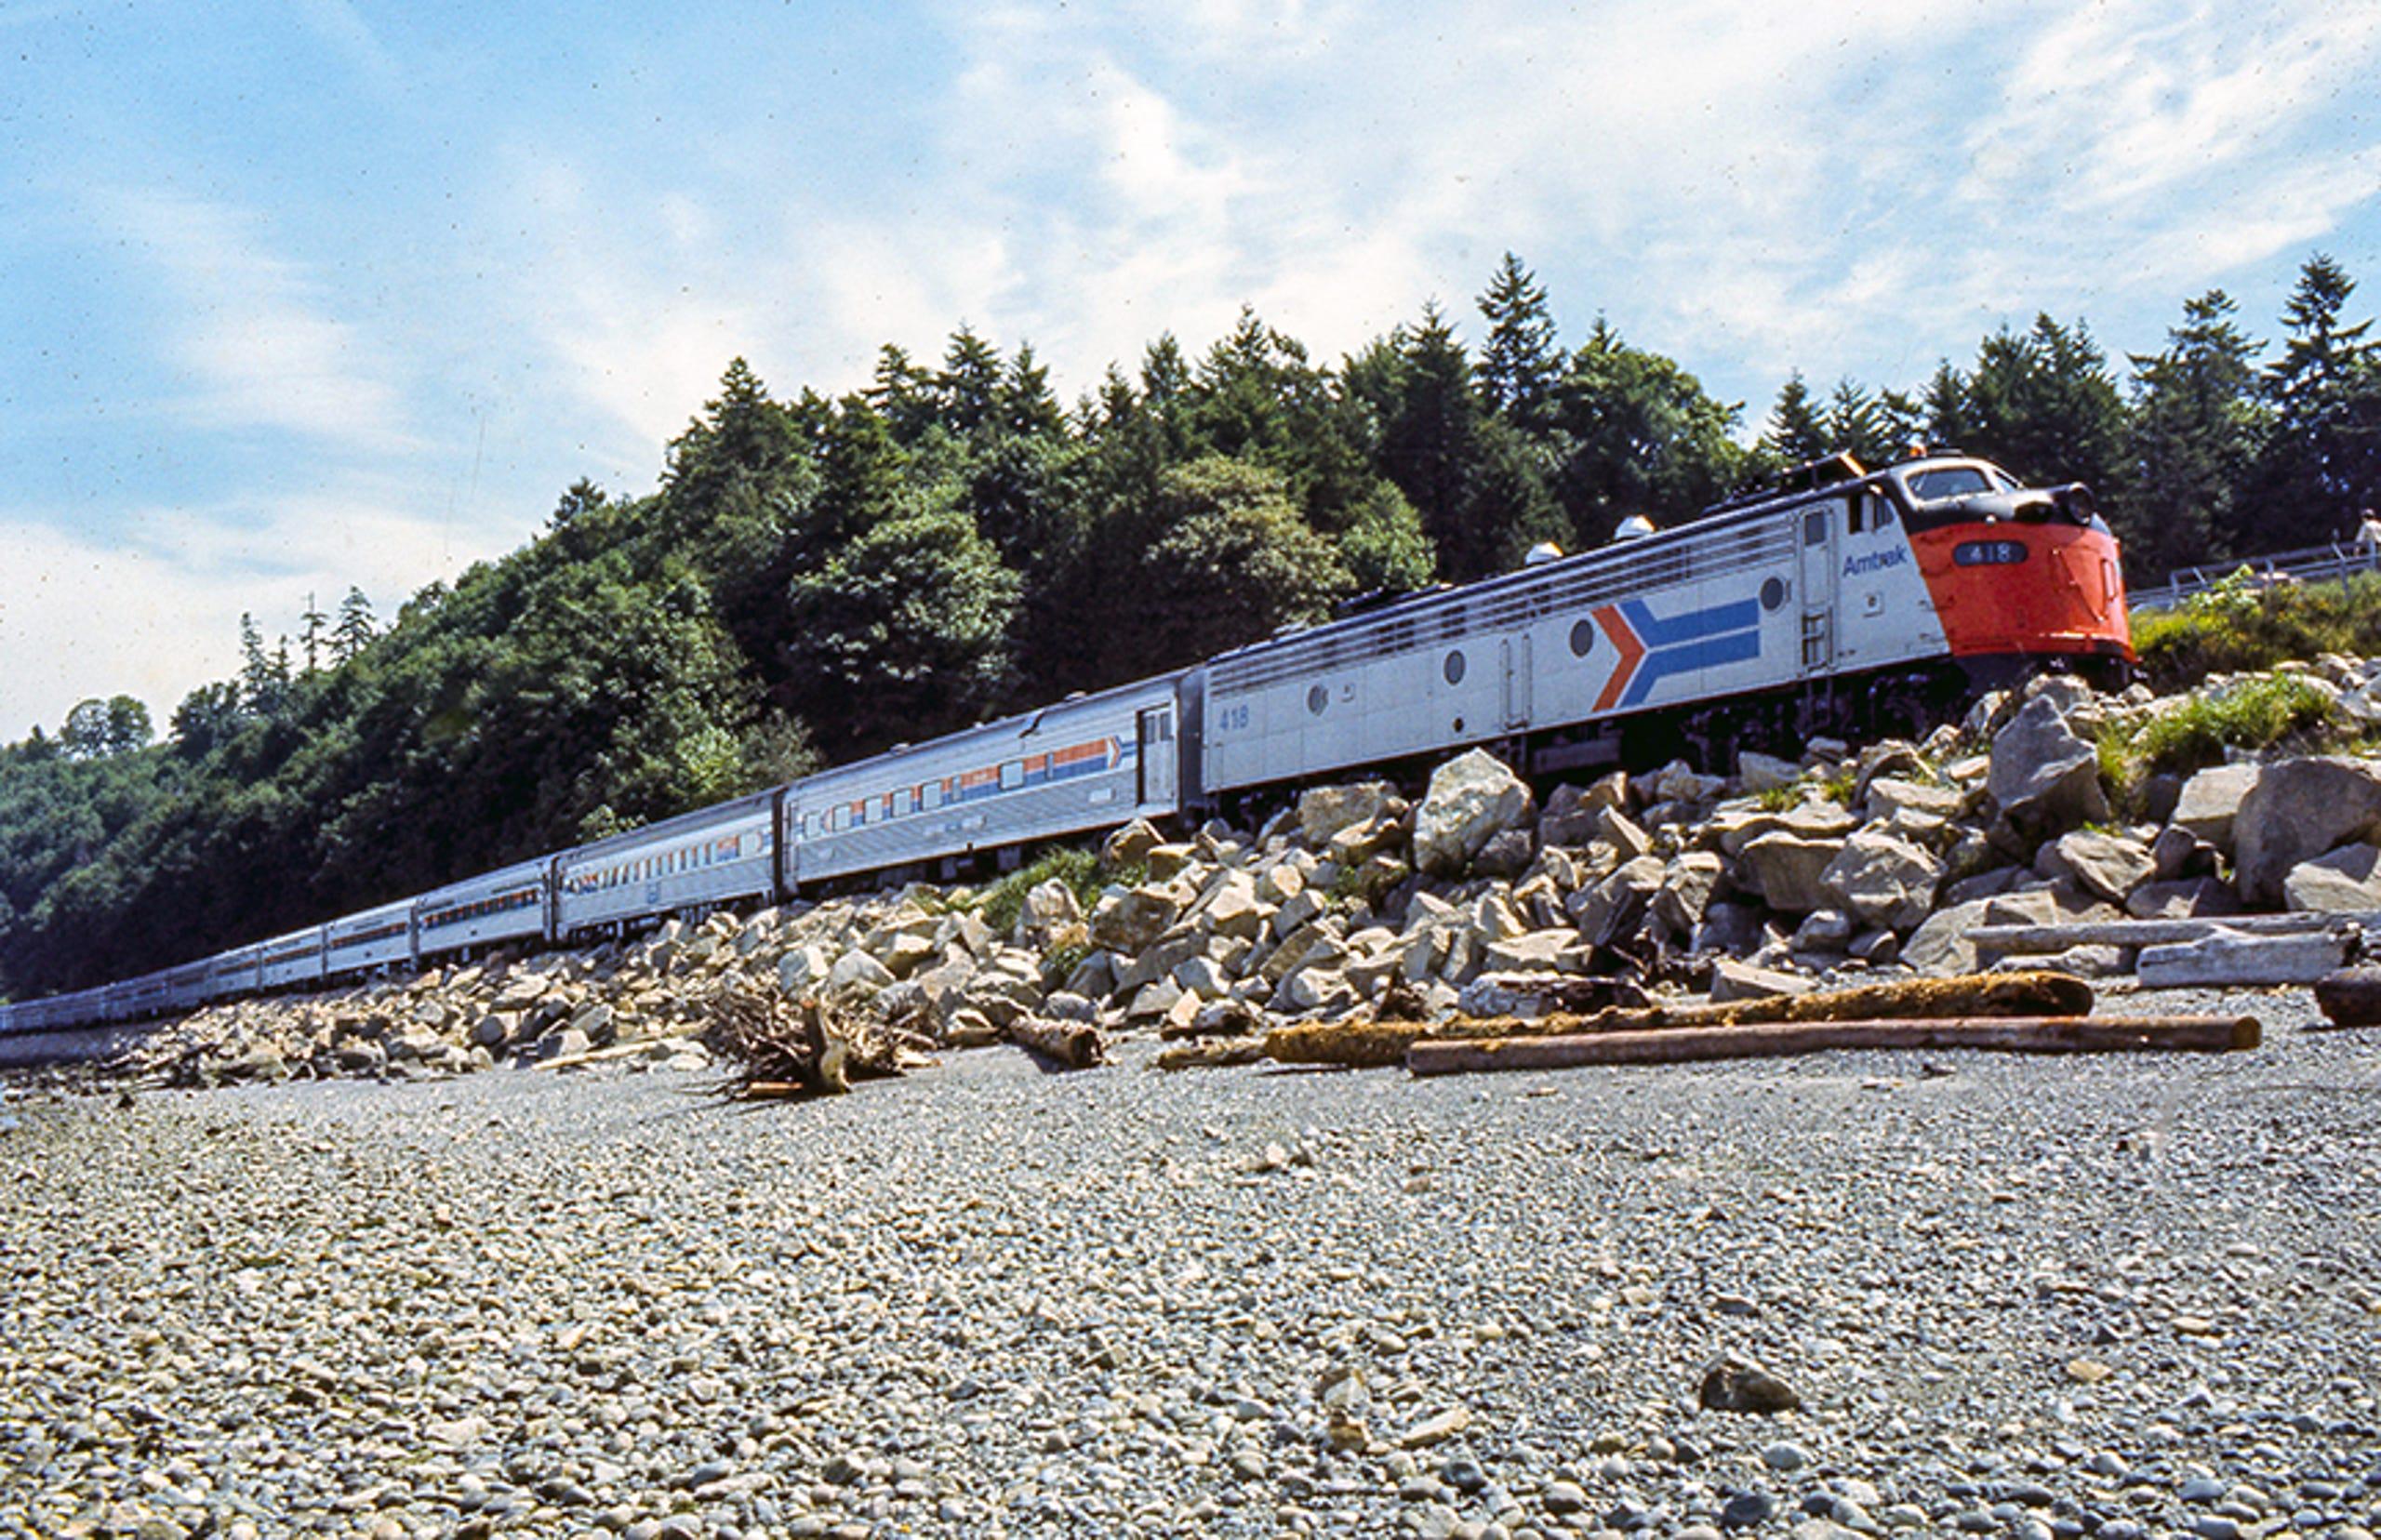 45 years of Amtrak locomotives